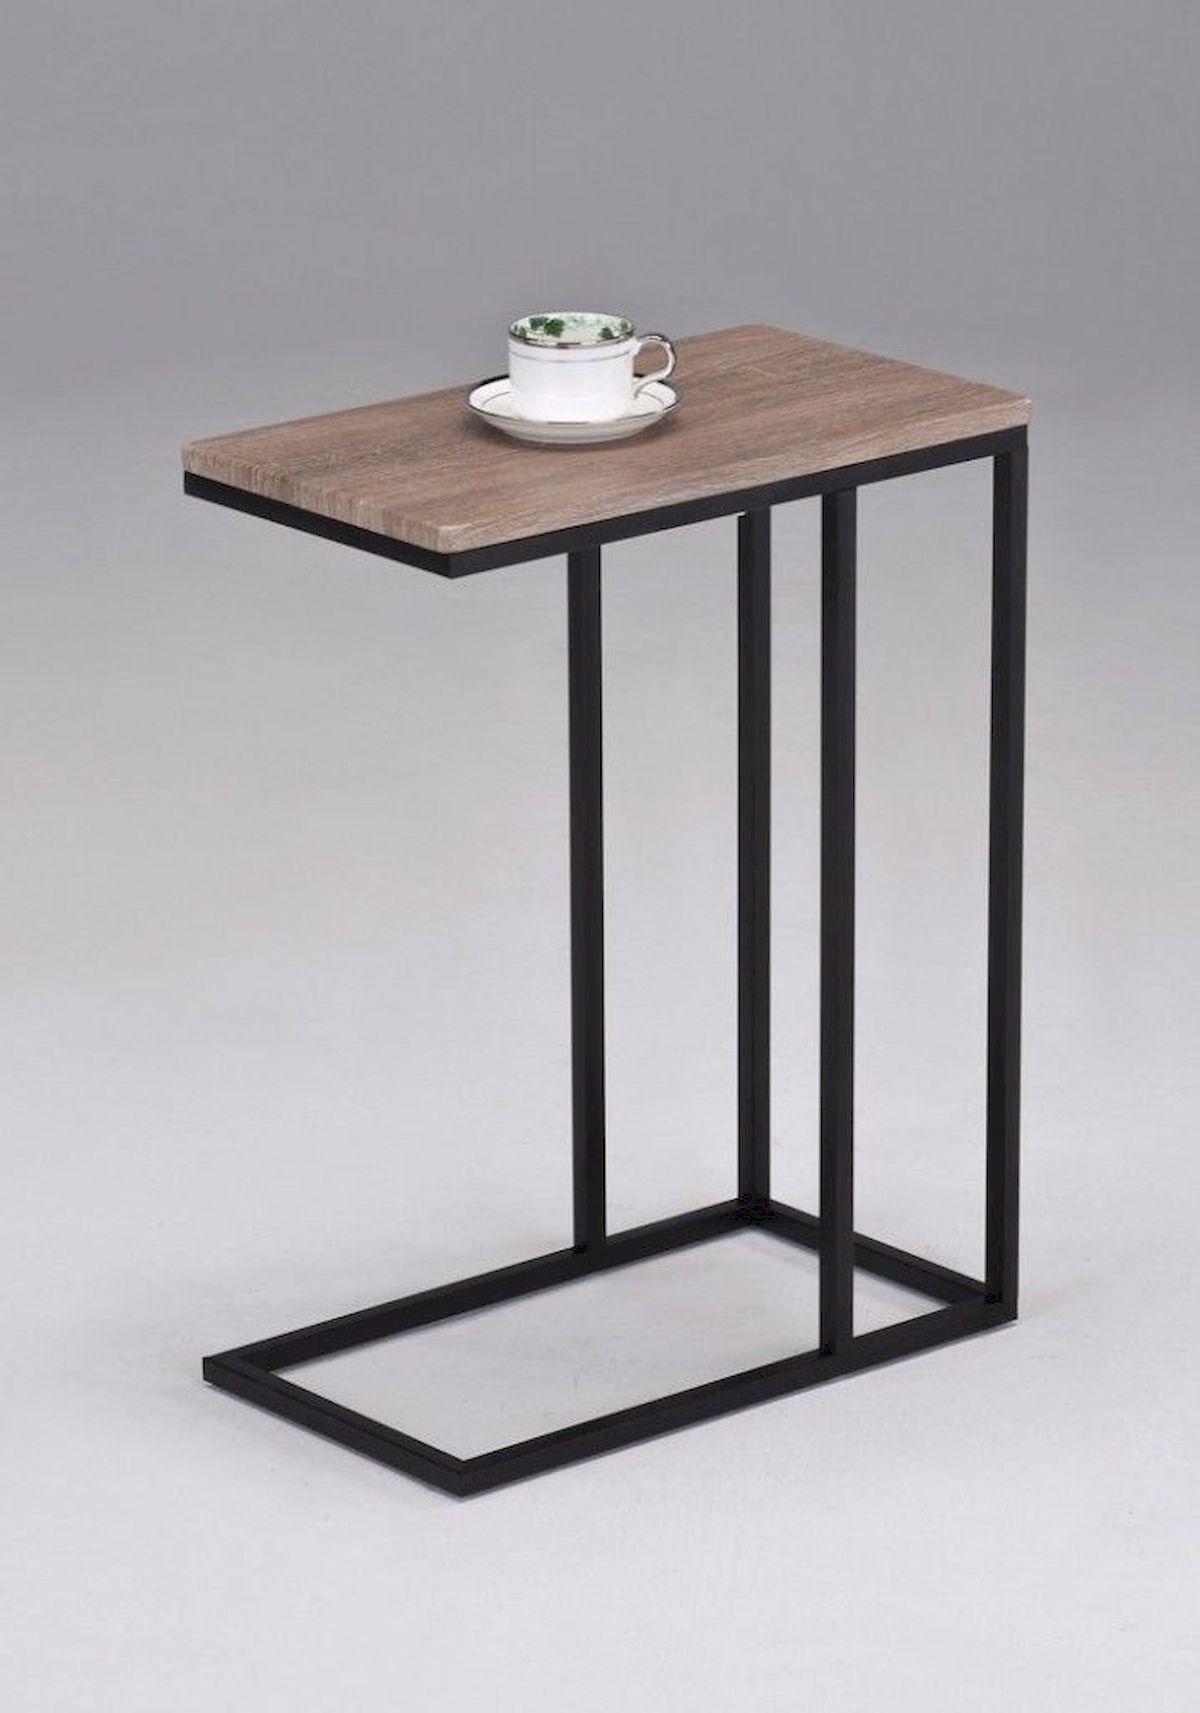 39 Side Tables Modern Charm